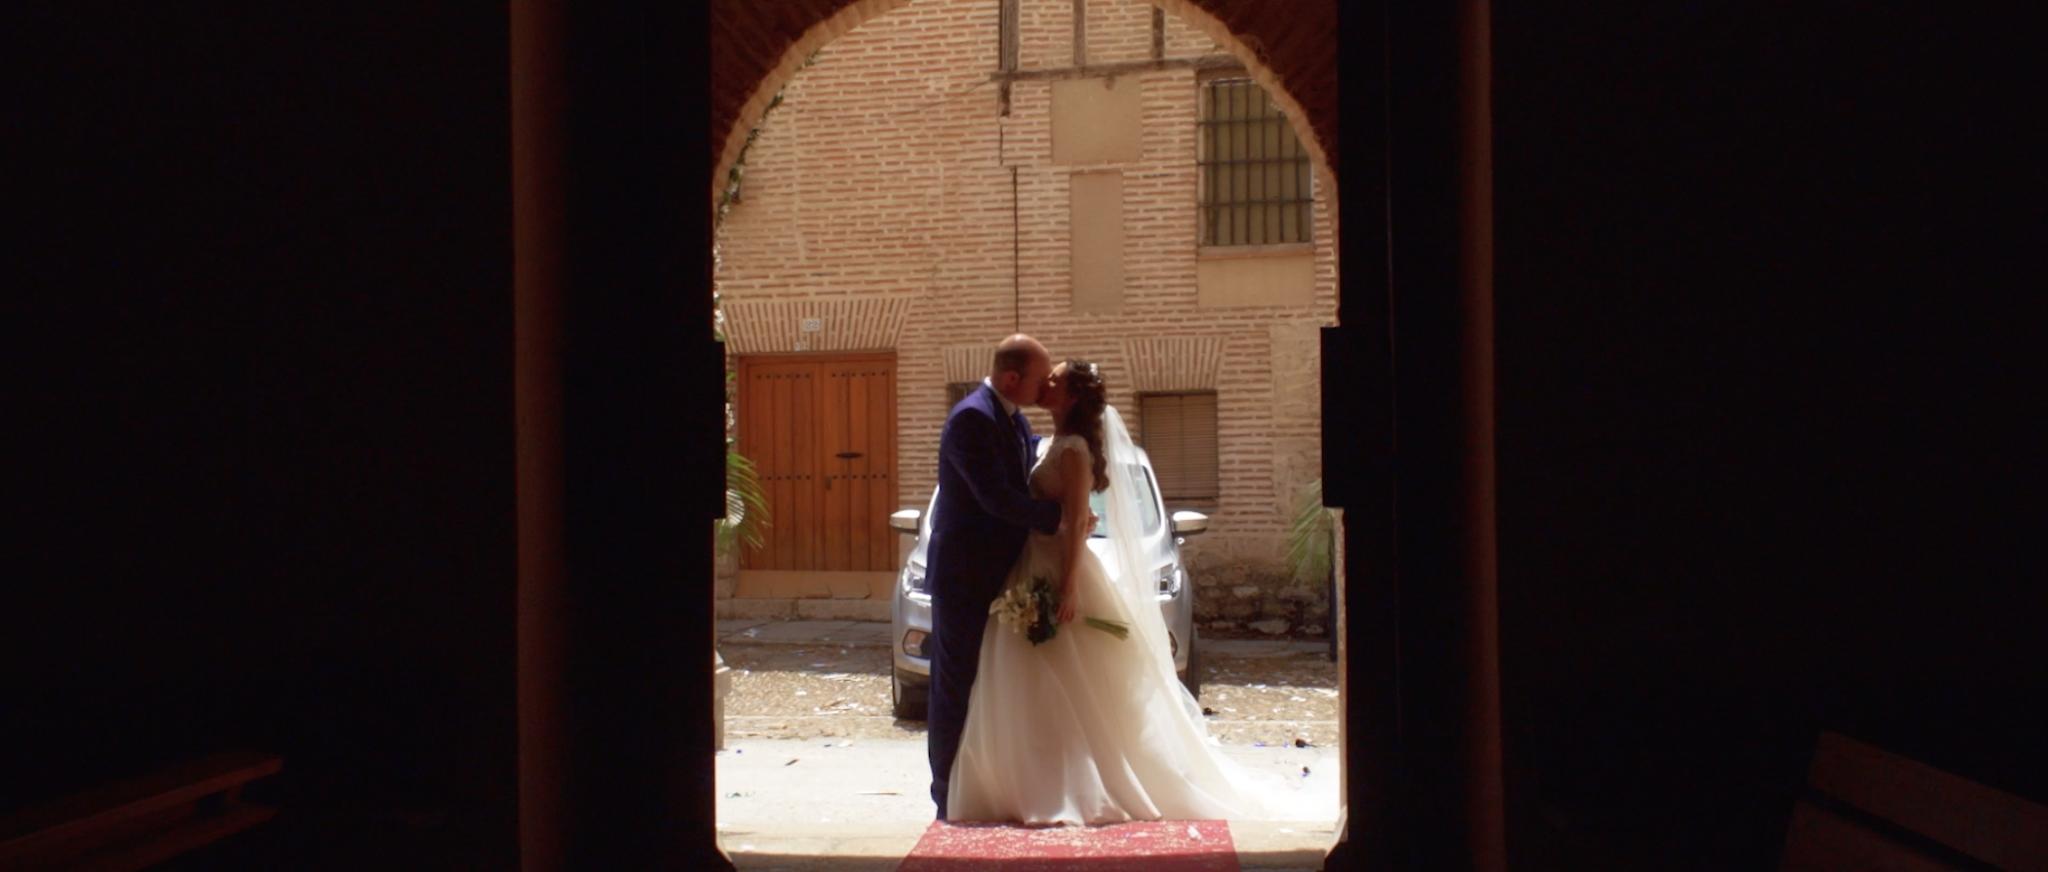 La boda de David y Silvia en Arevalo, Ávila